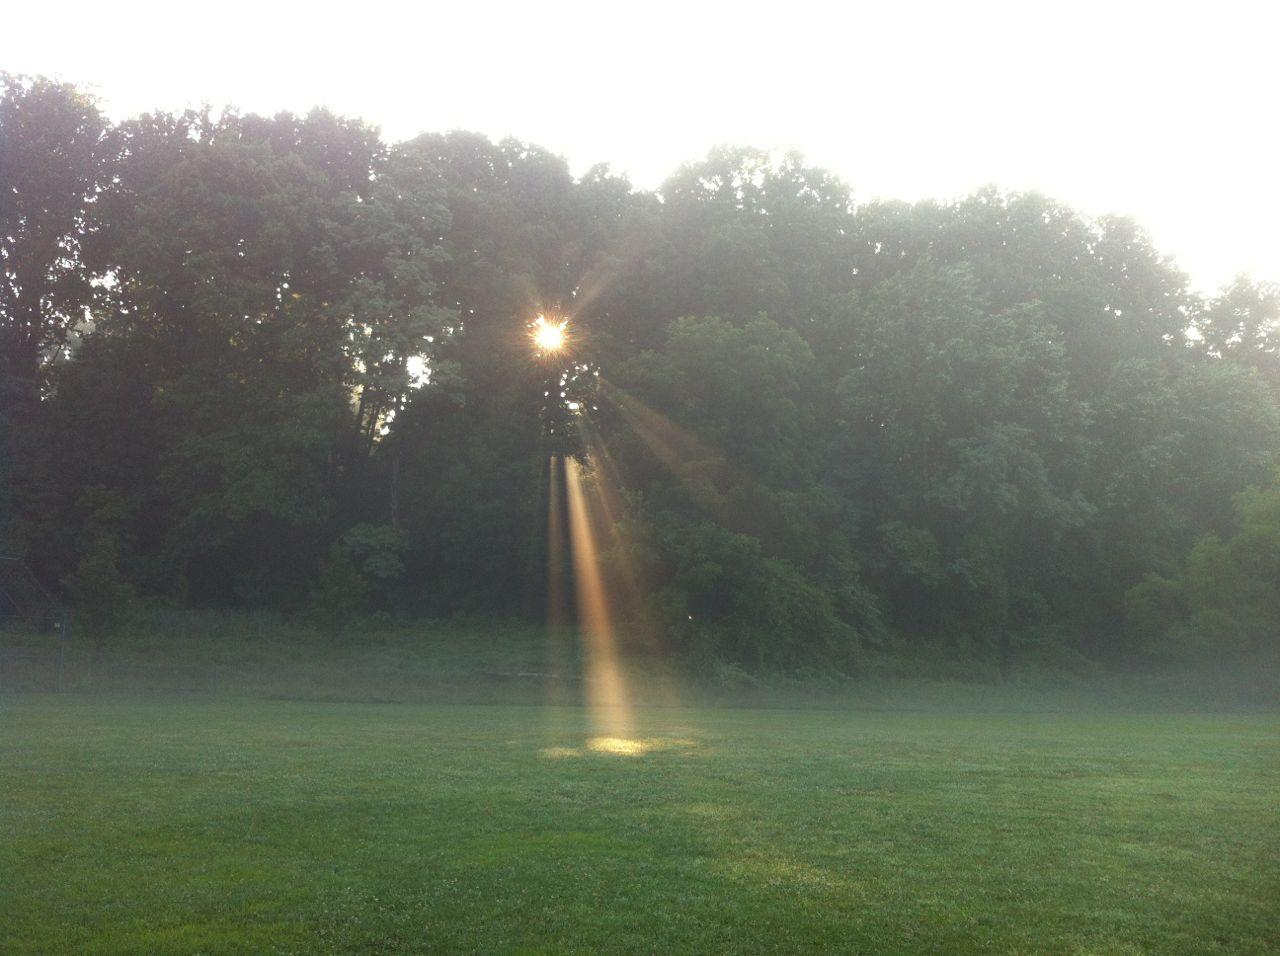 http://zhurnaly.com/images/running/Misty_Morning_Sunbeam_at_KenGar.jpg